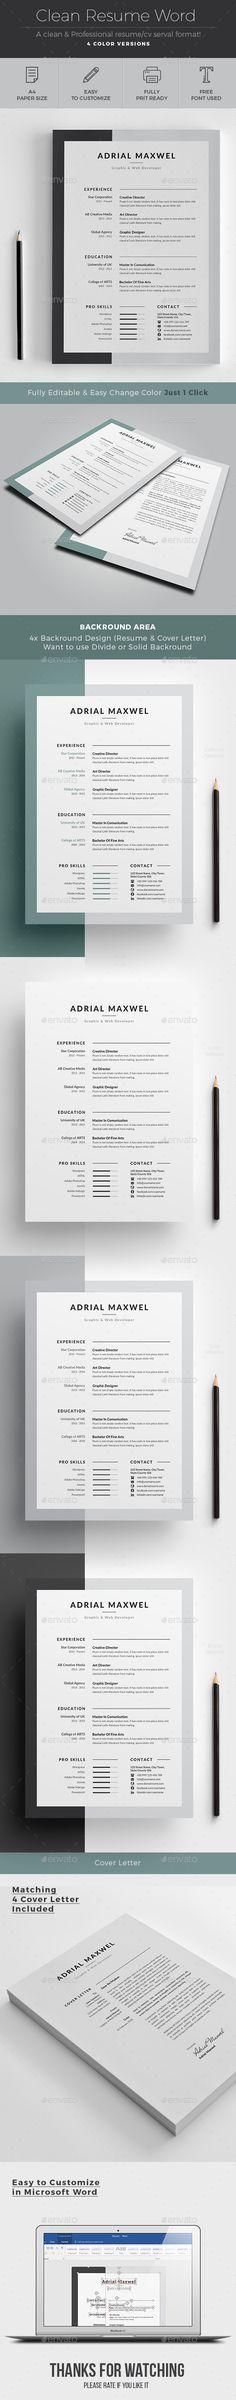 328 best Documents design ideas images on Pinterest Resume - dlsu resume format